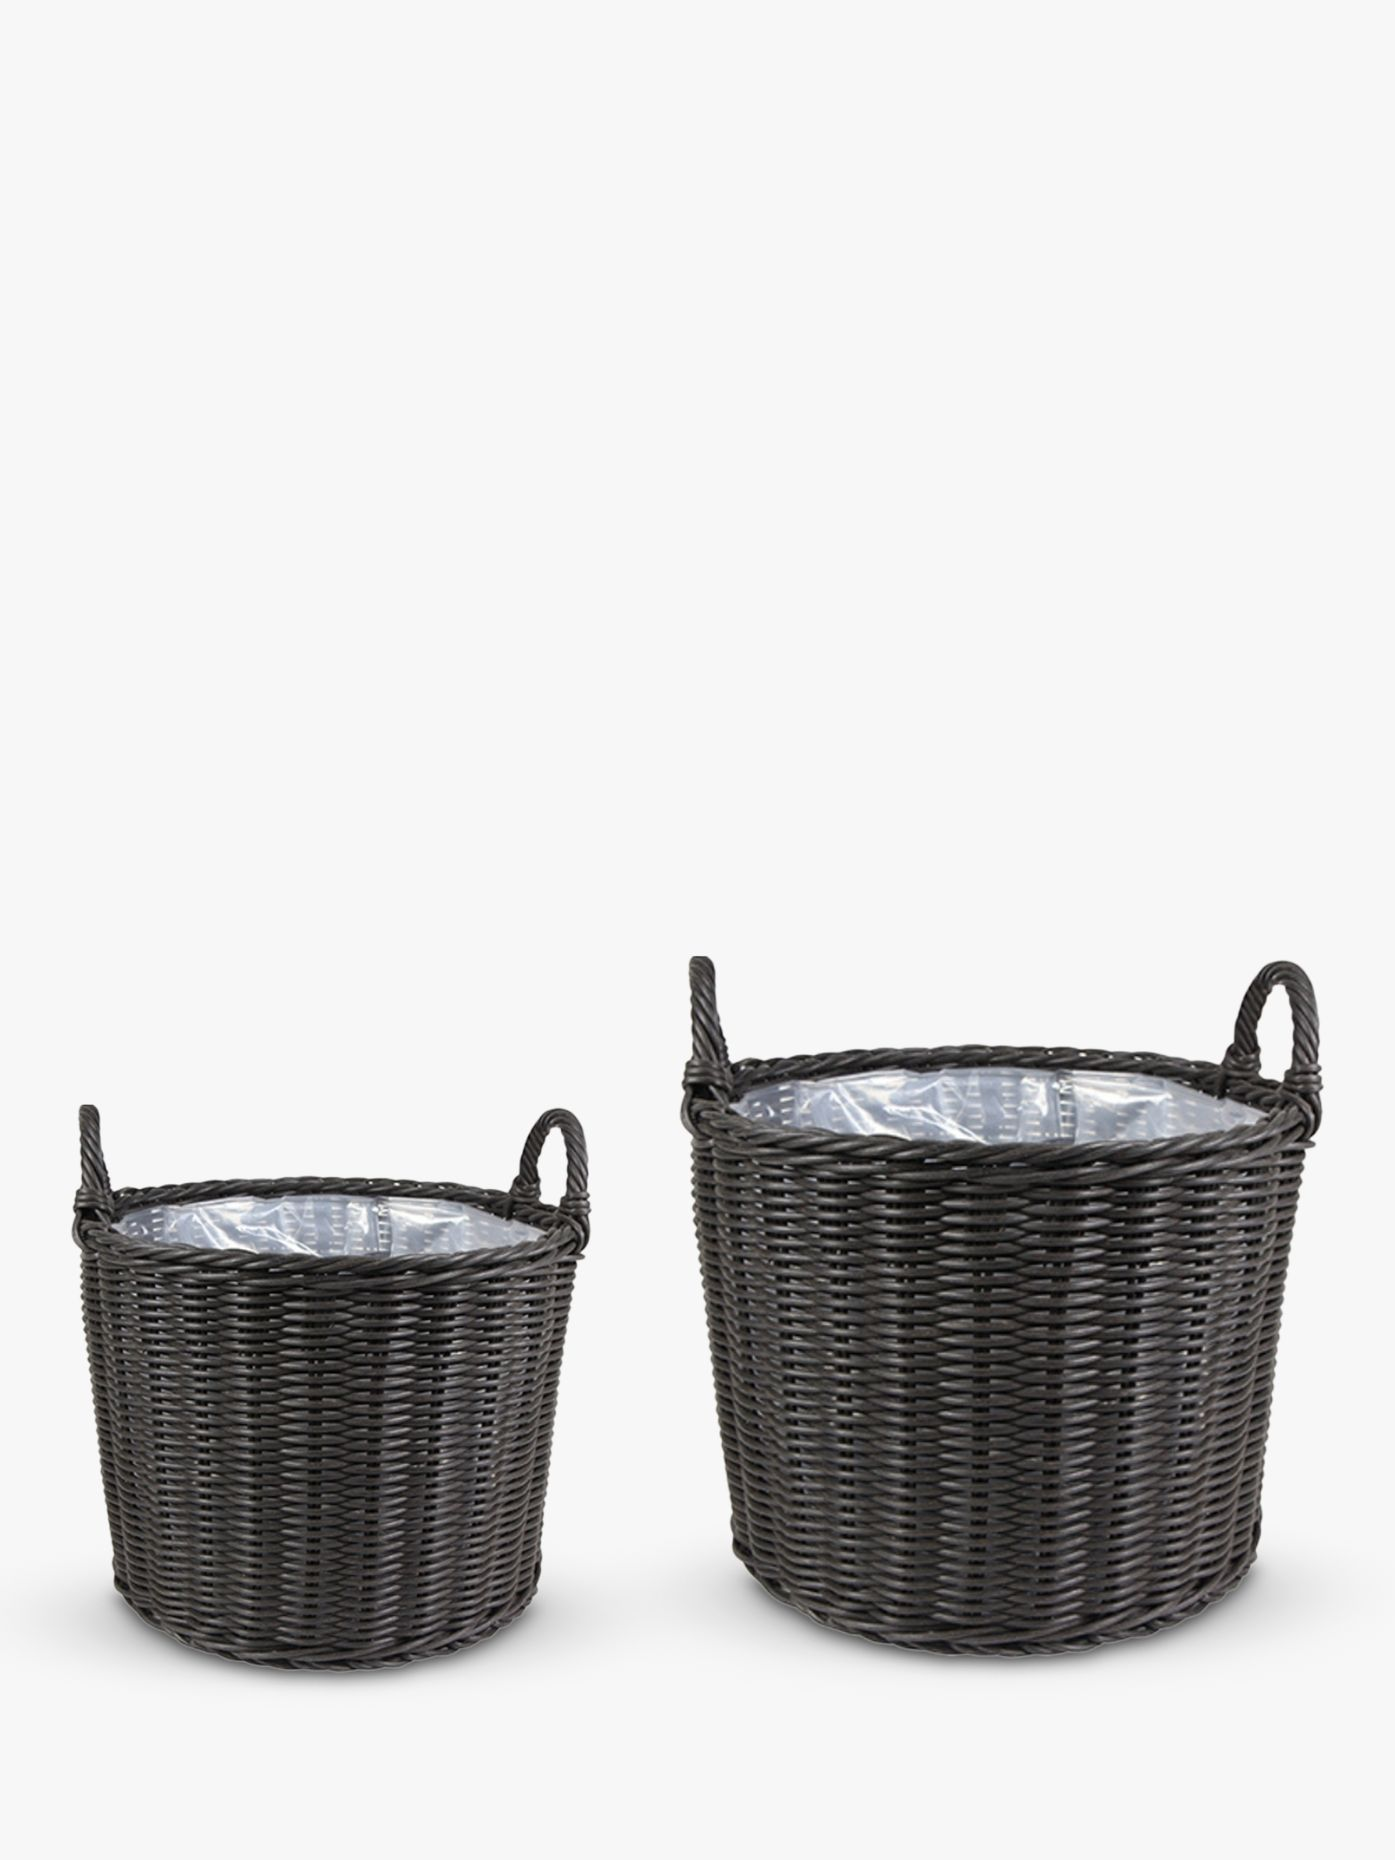 Ivyline Woven Rattan Outdoor Basket Planters, Set of 2